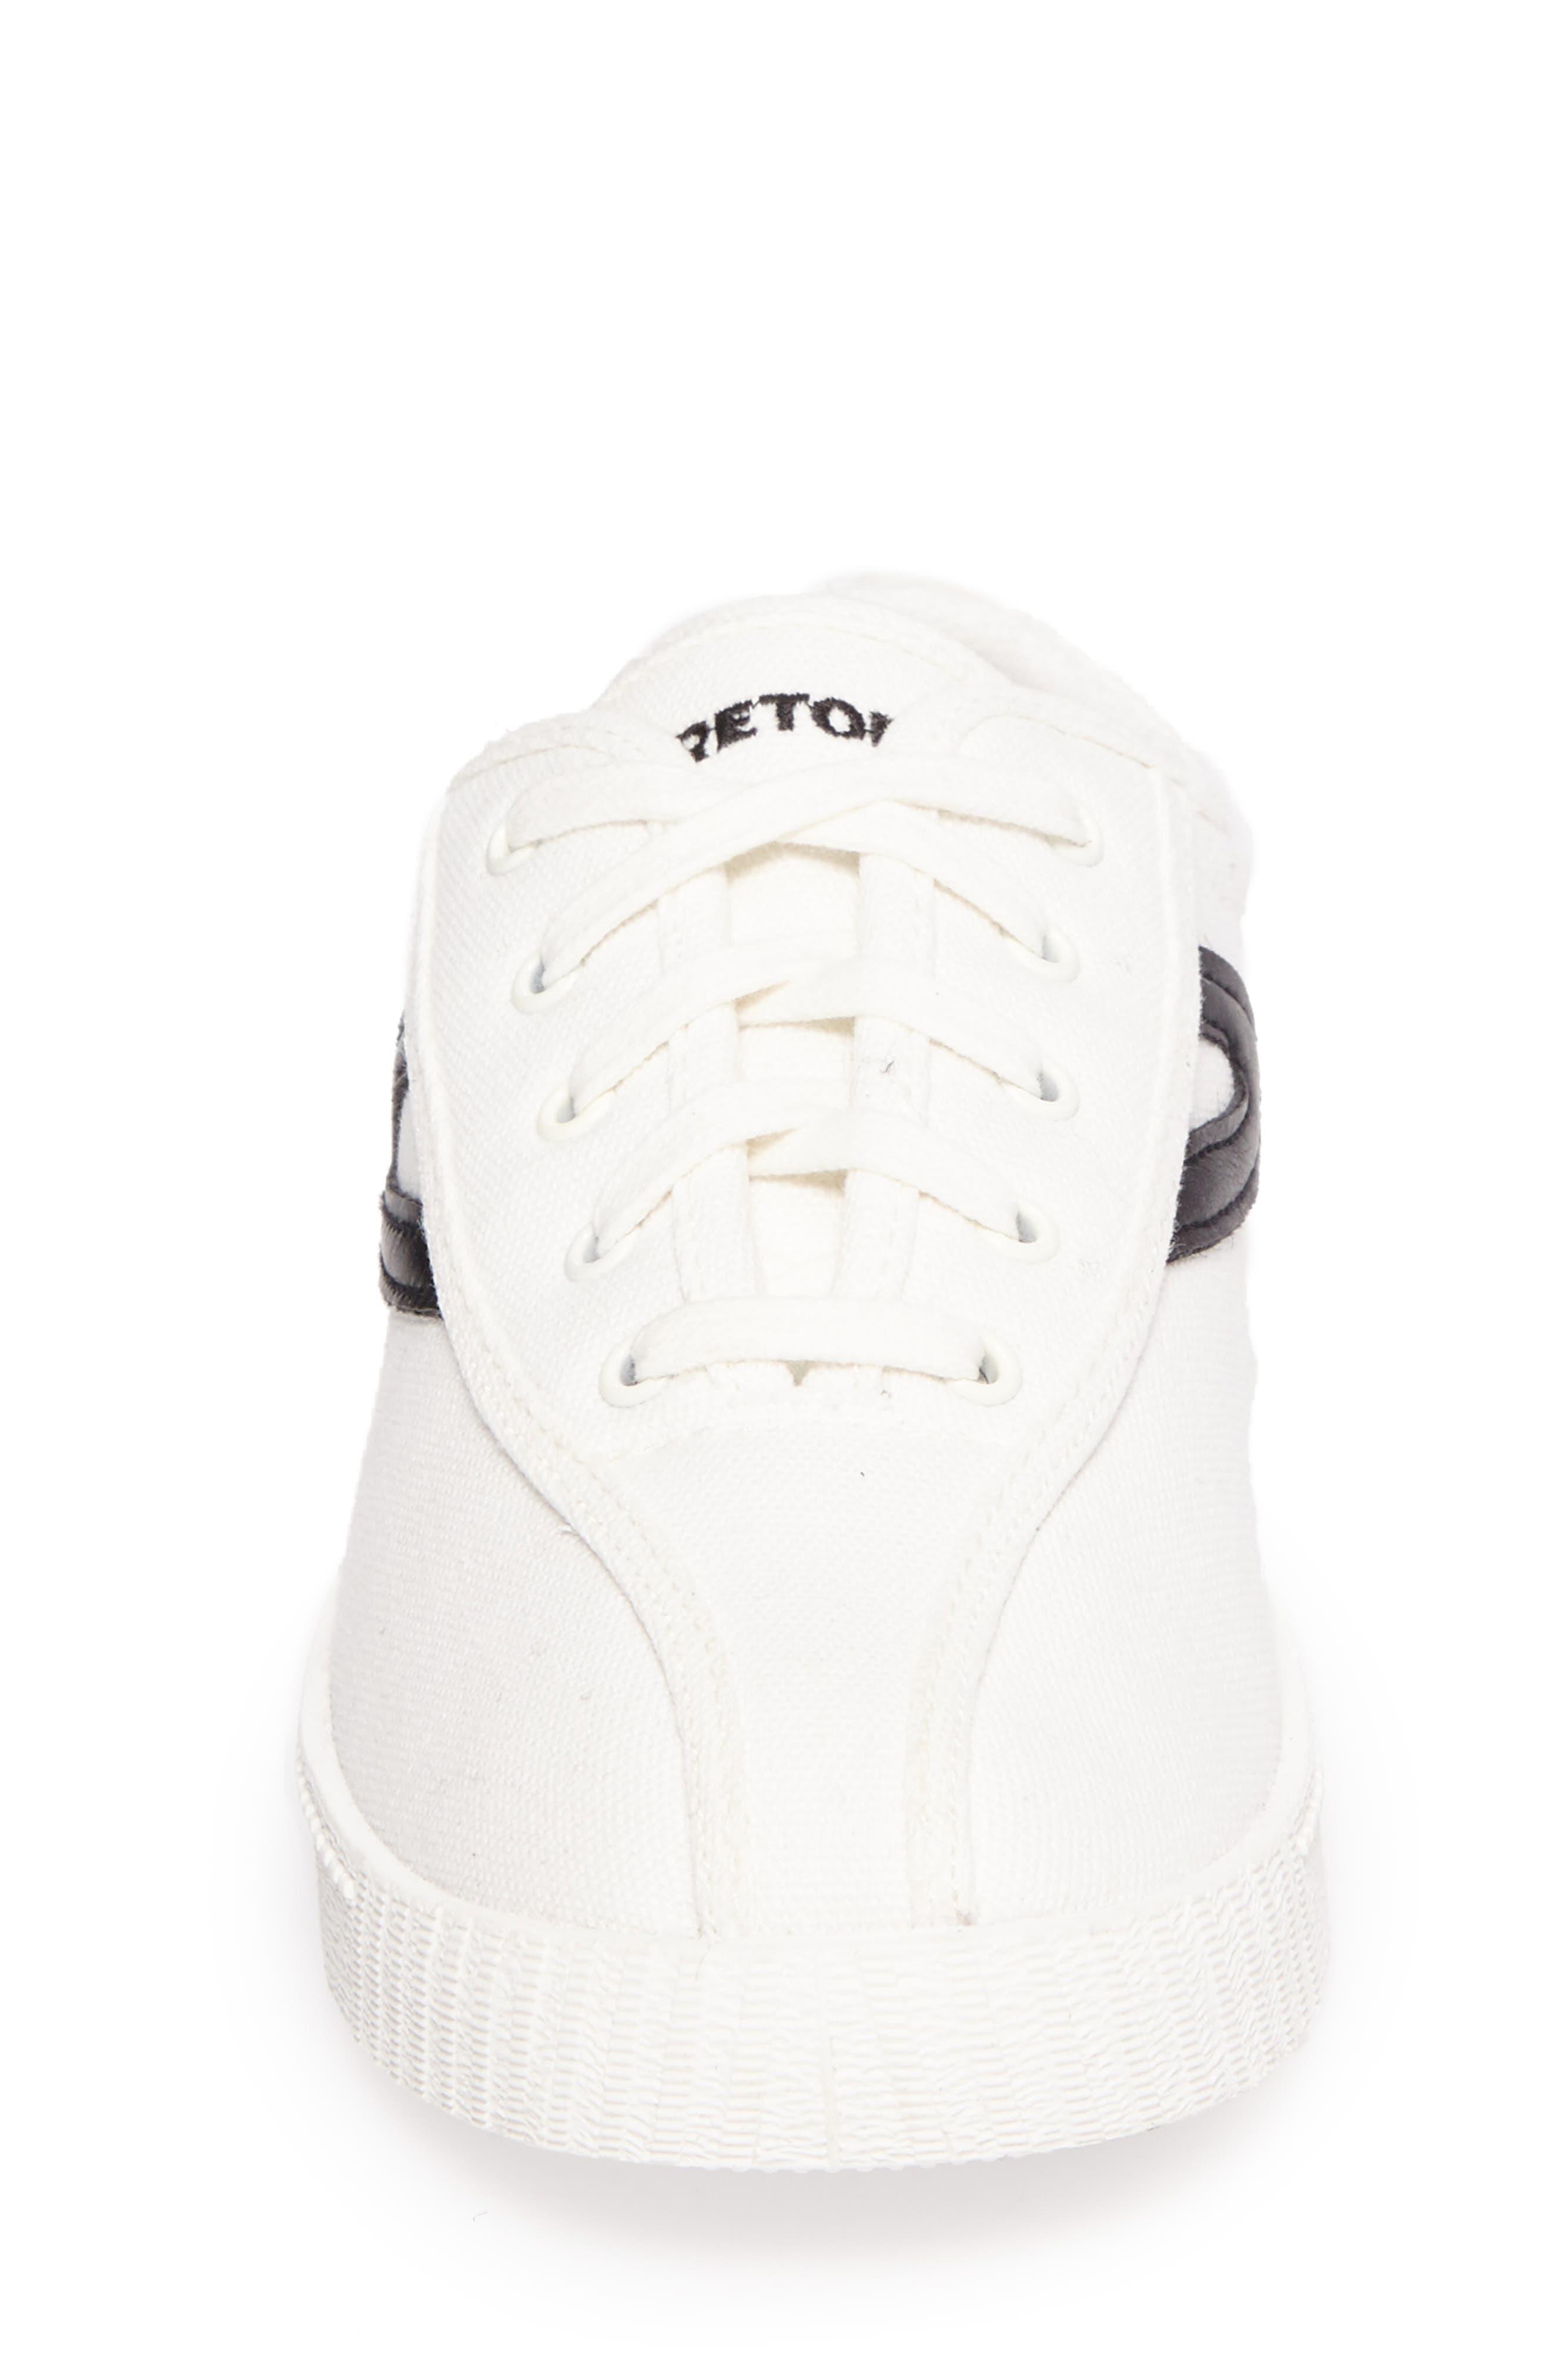 Nylite Plus Sneaker,                             Alternate thumbnail 4, color,                             White/ Black